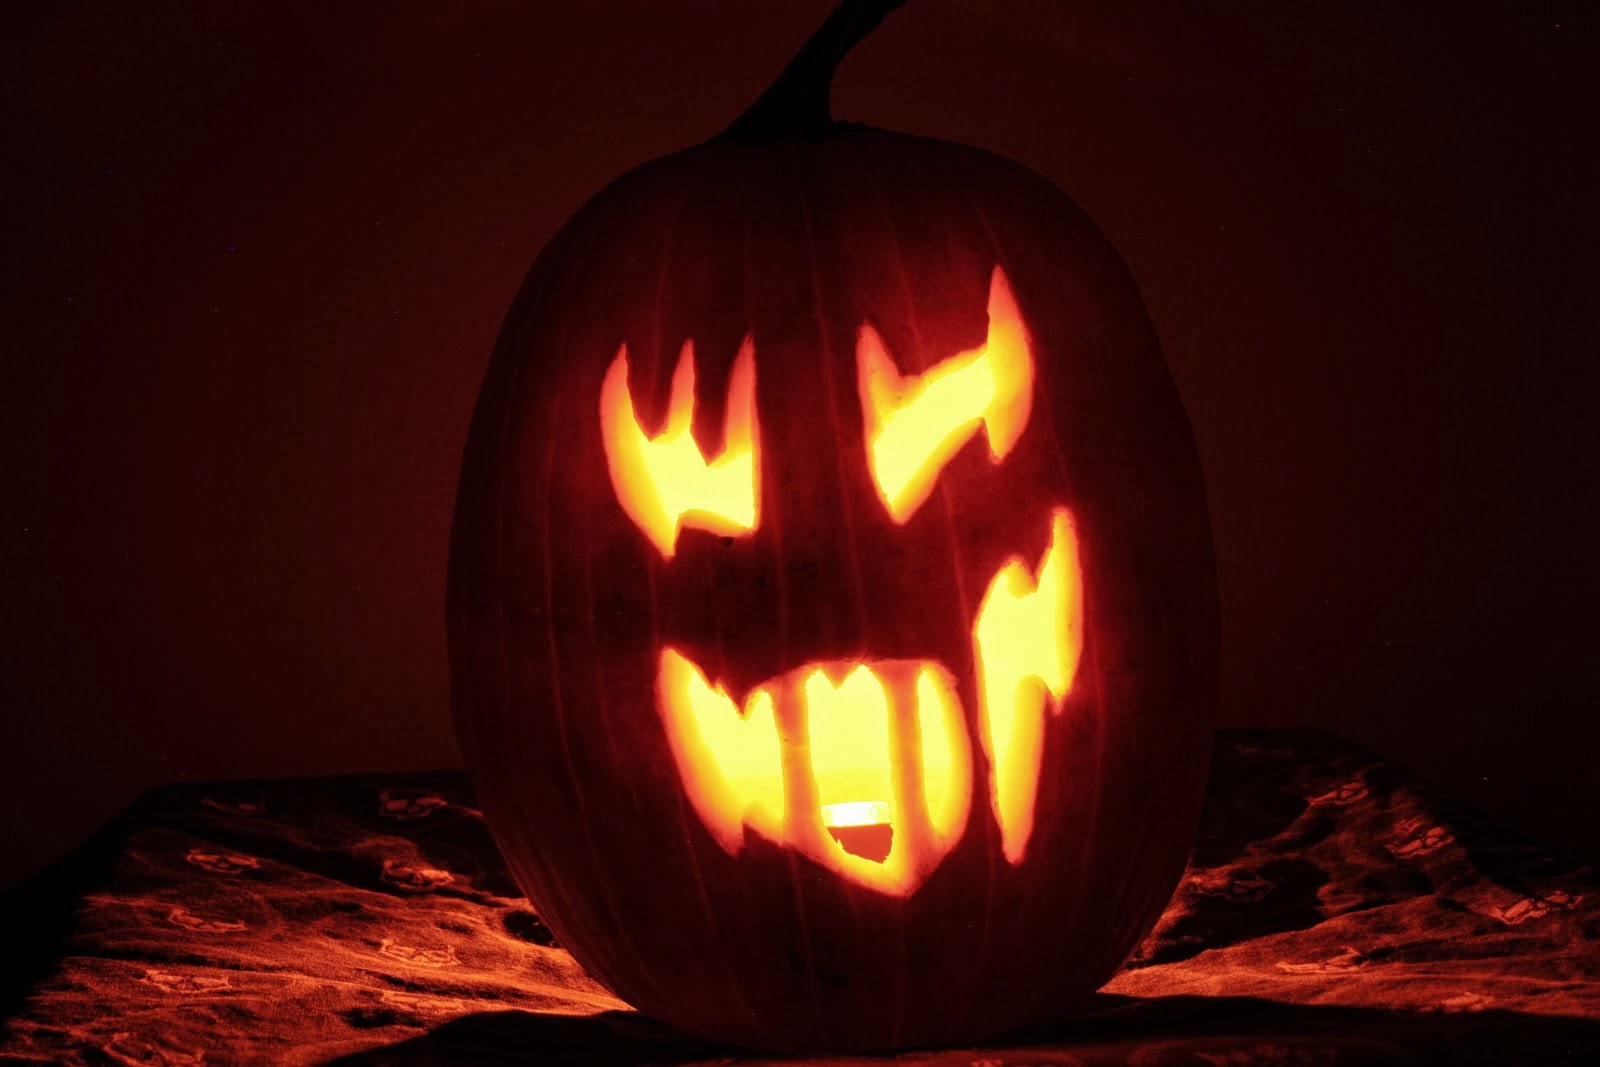 Pumpkin Carving Ideas For Halloween 2017 More Crazy